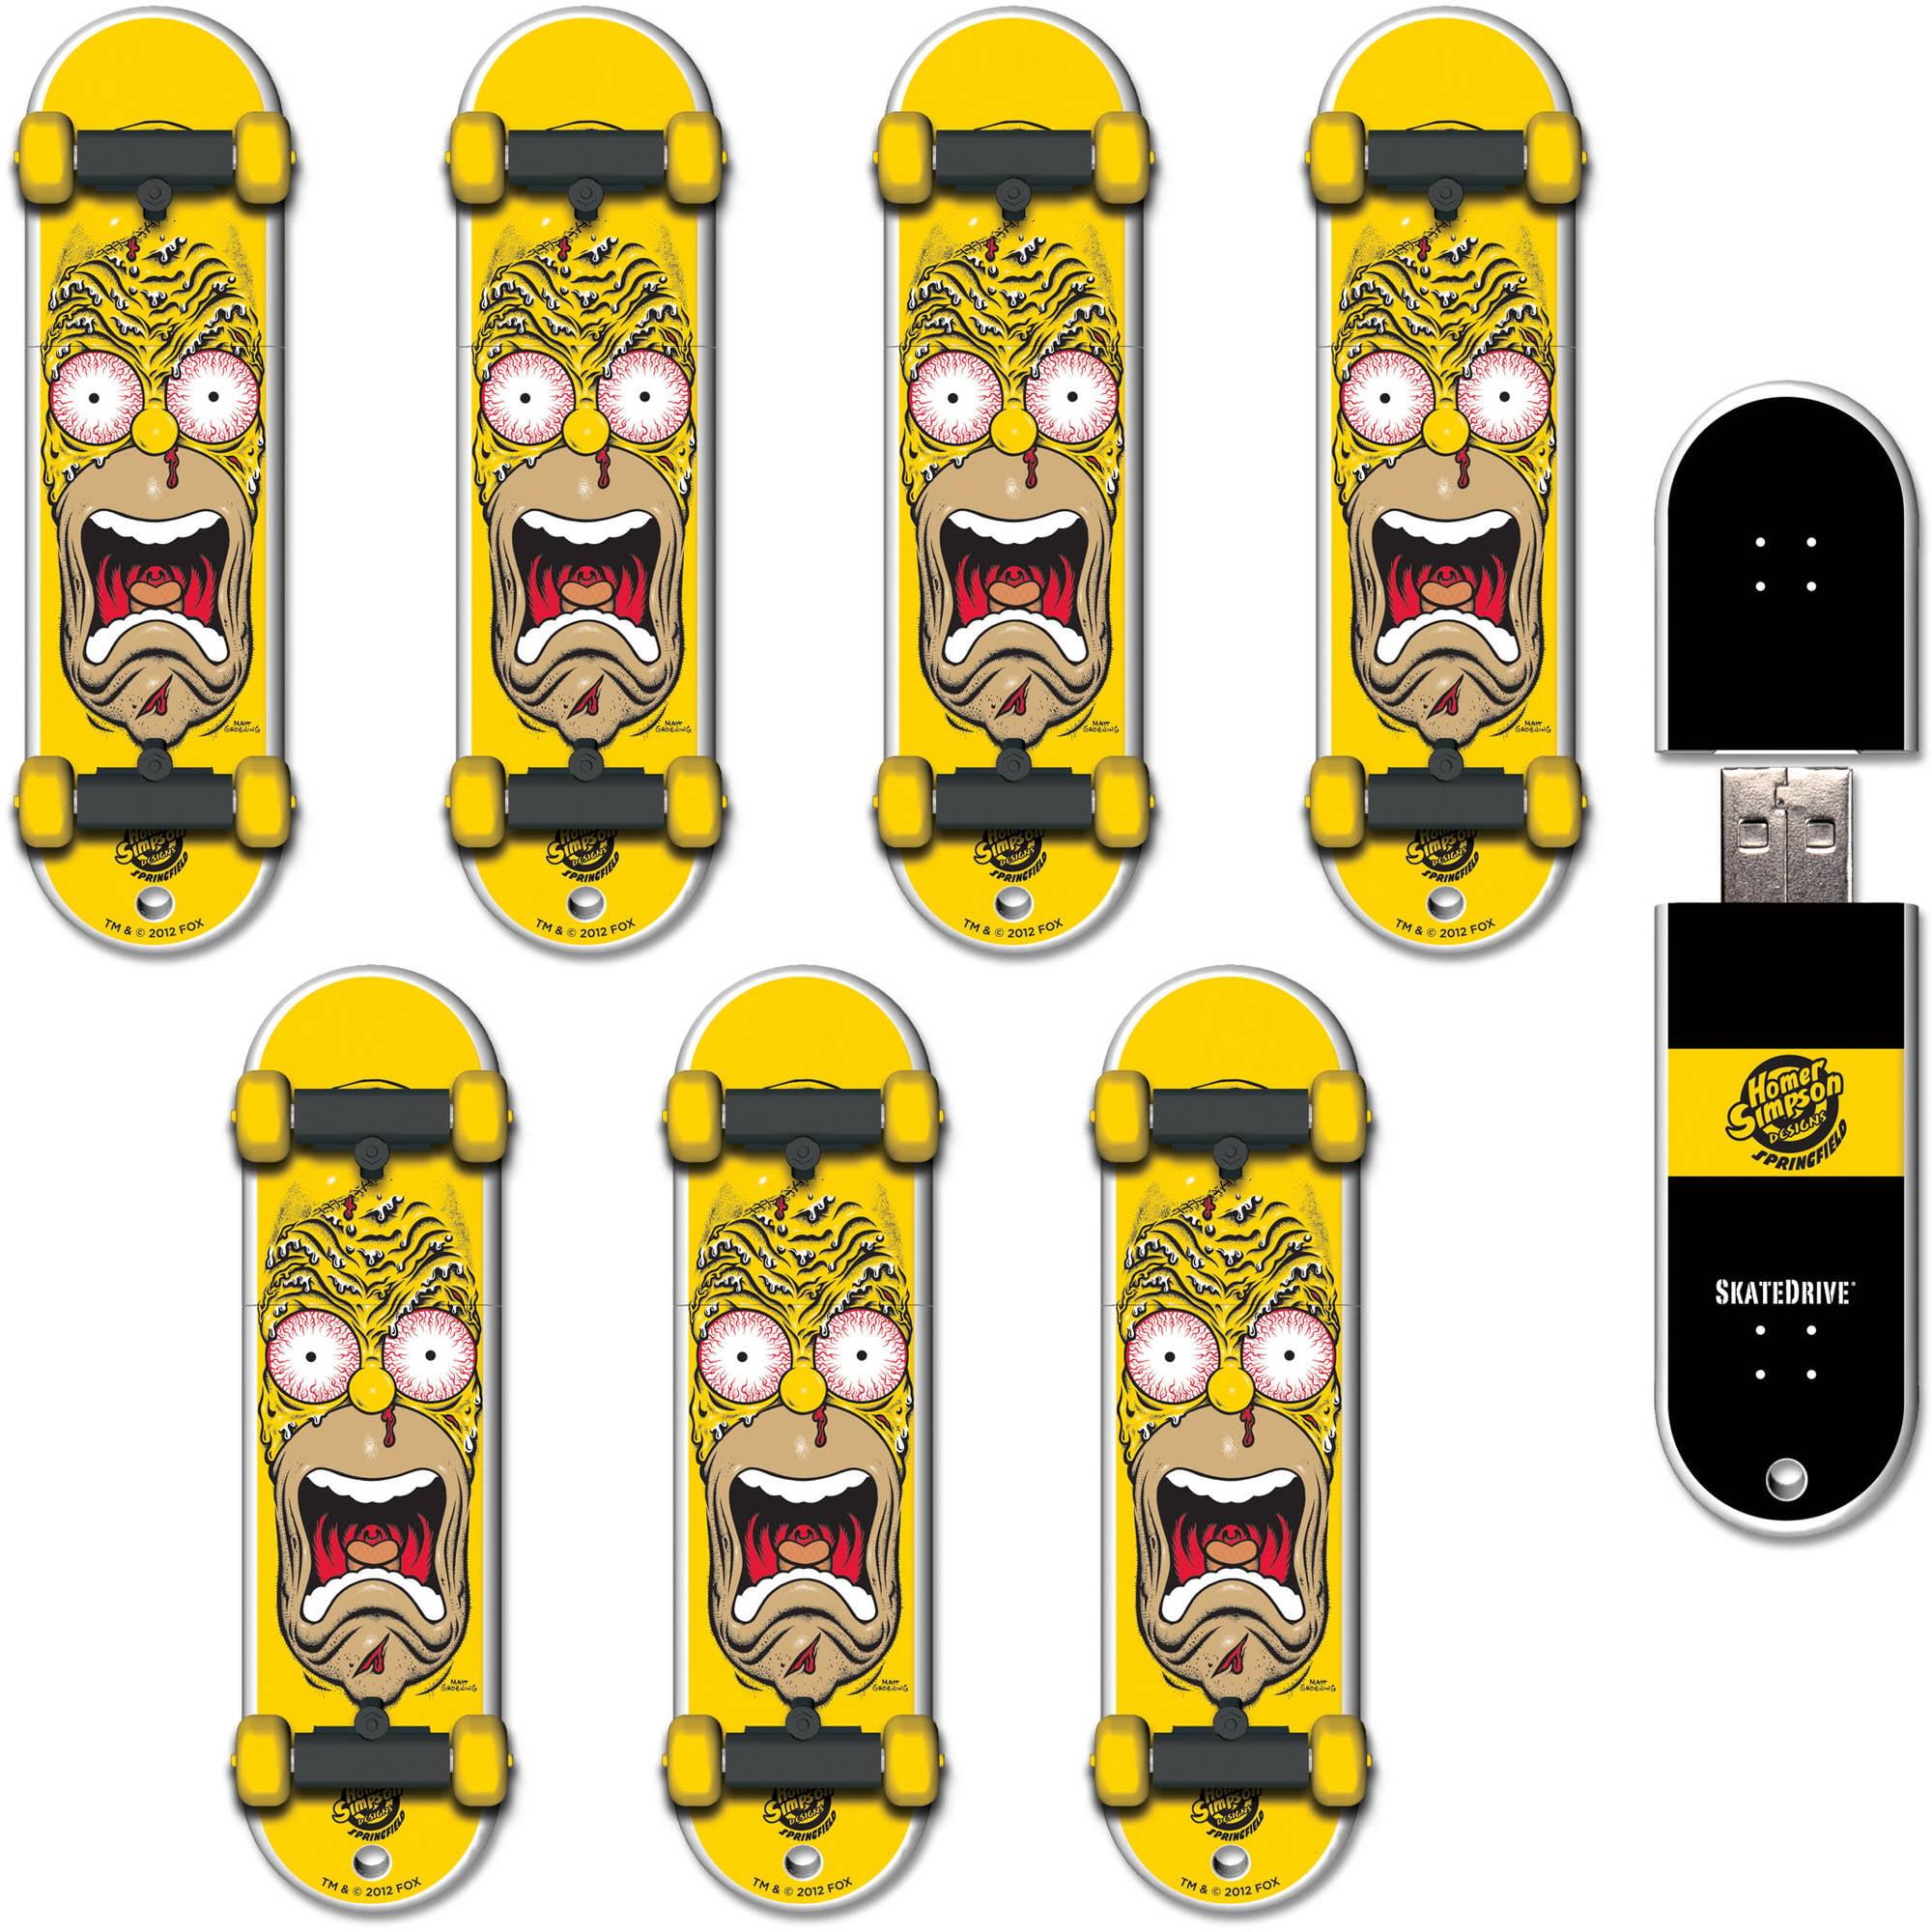 Image of 16GB SkateDrive Santa Cruz: Homer Face USB Flash Drive, 8-Pack